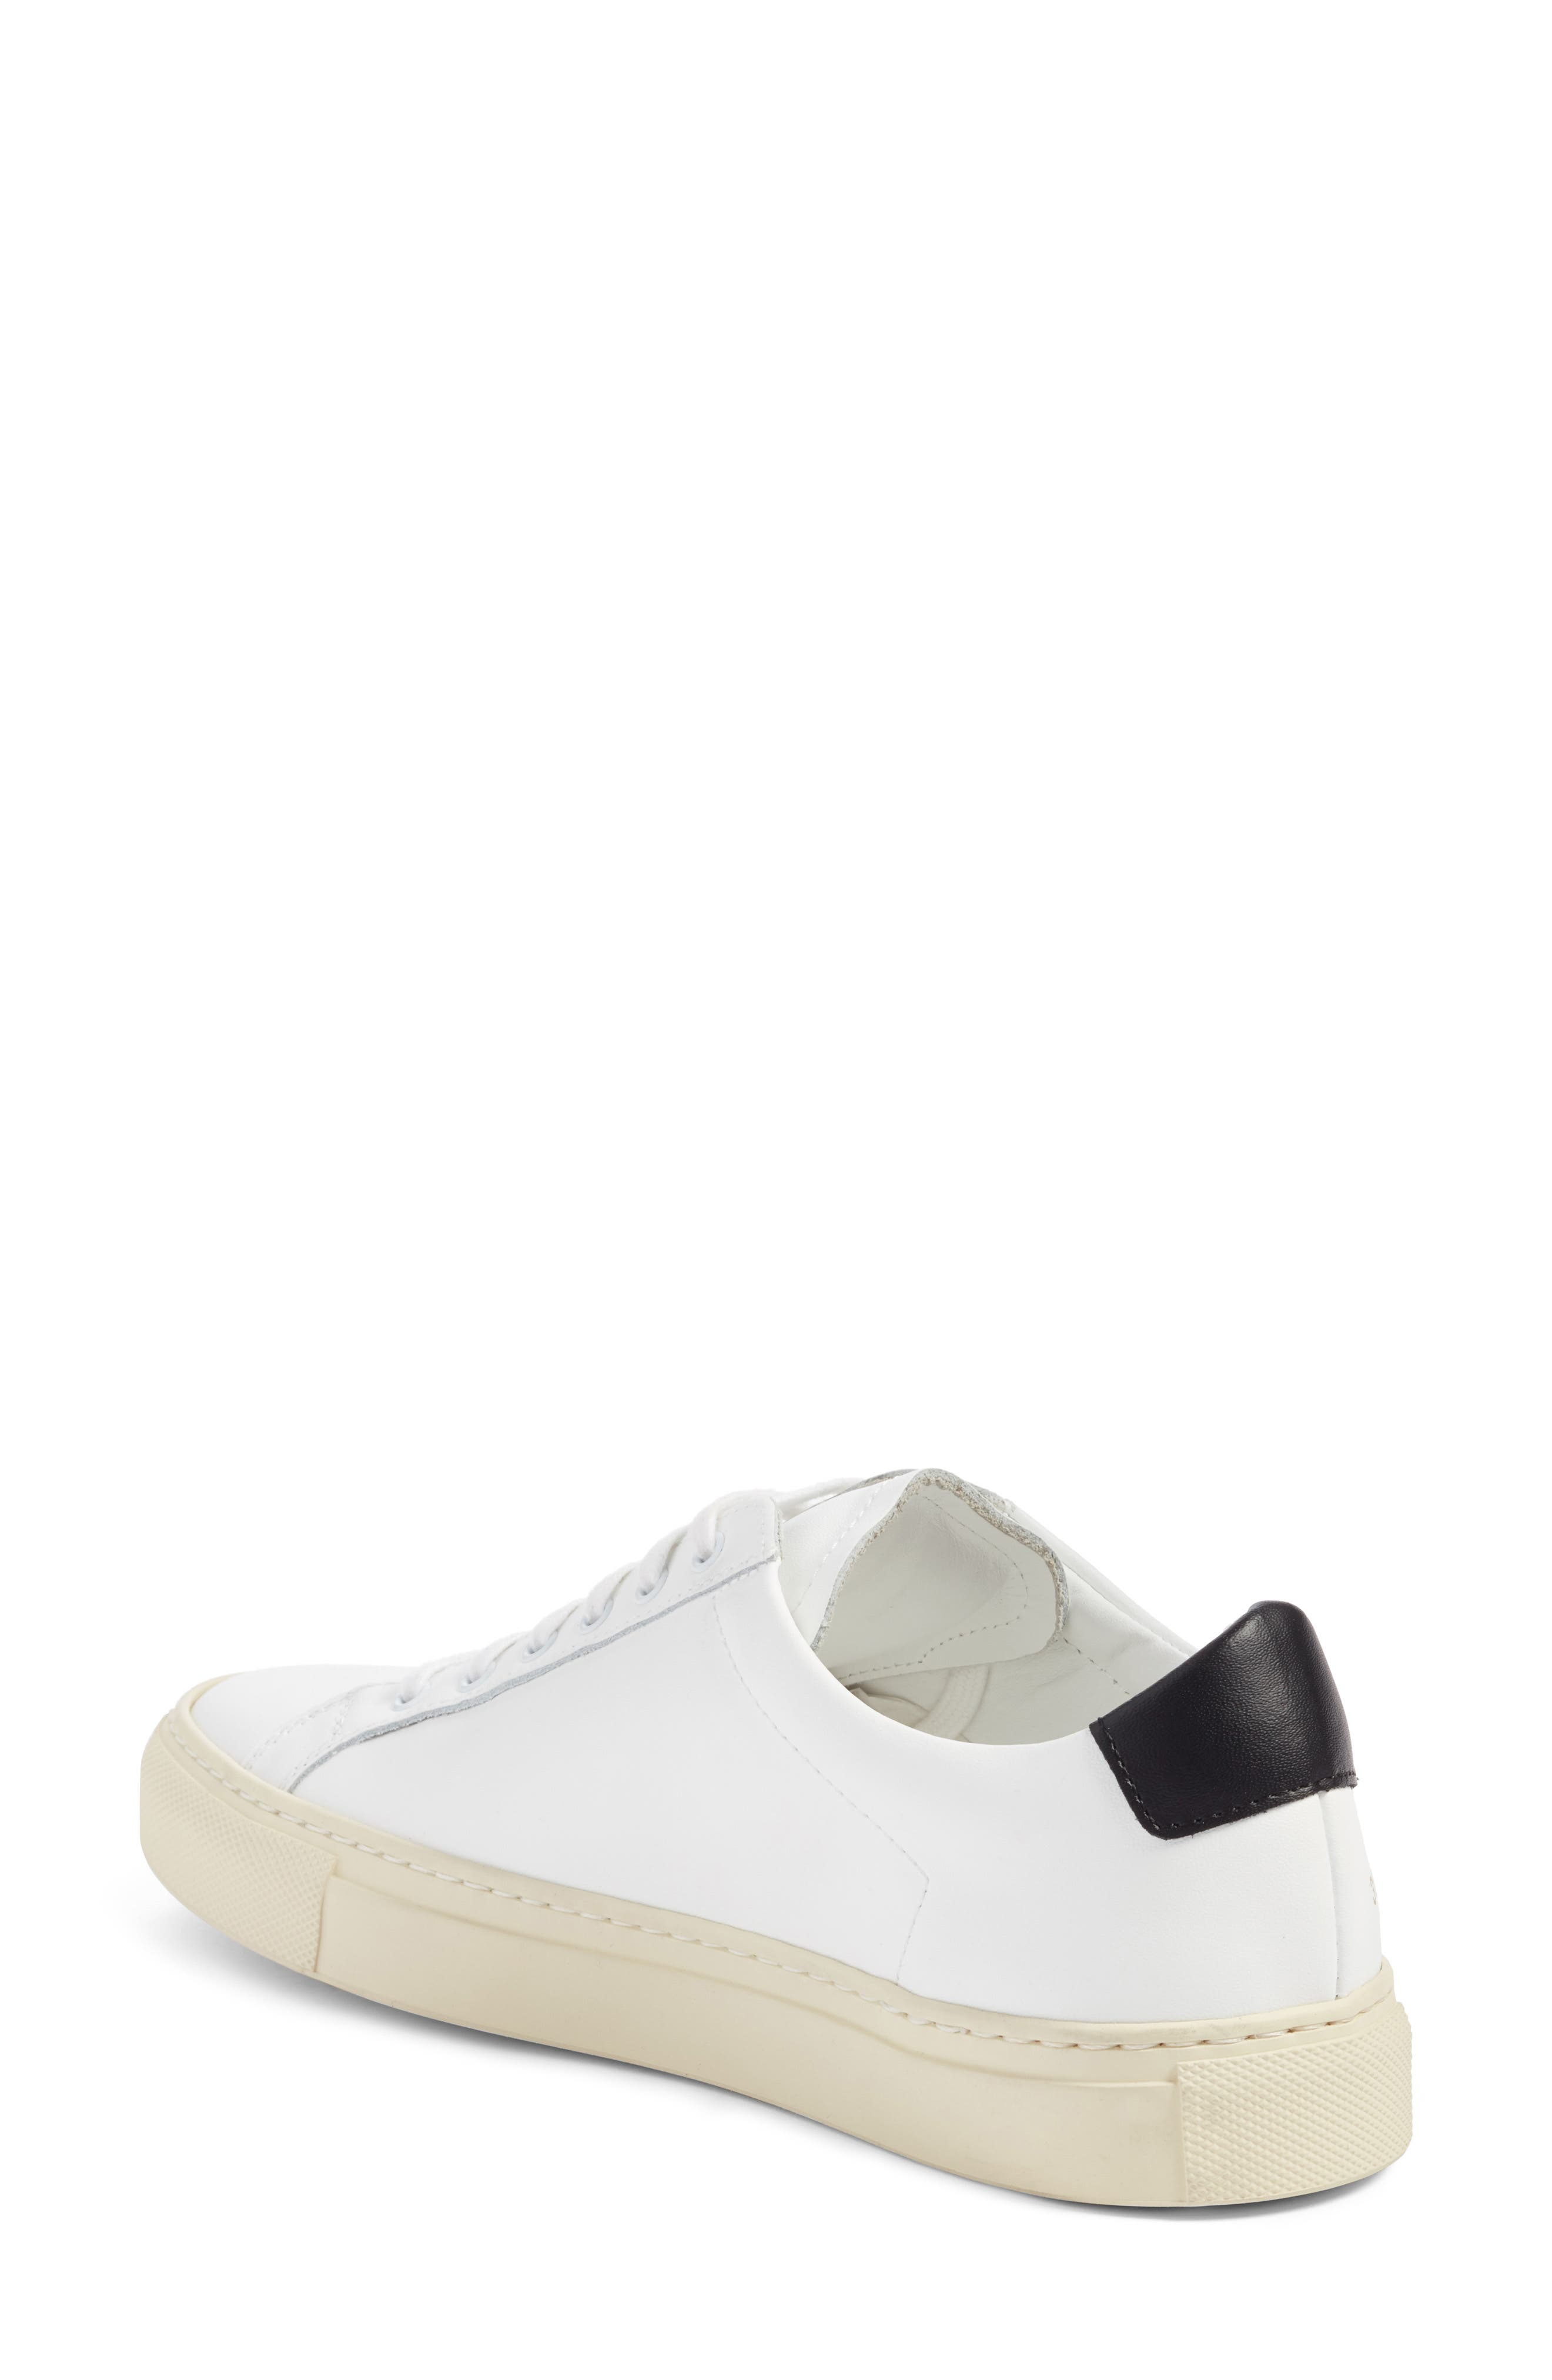 Achilles Low Top Sneaker,                             Alternate thumbnail 2, color,                             White/ Black